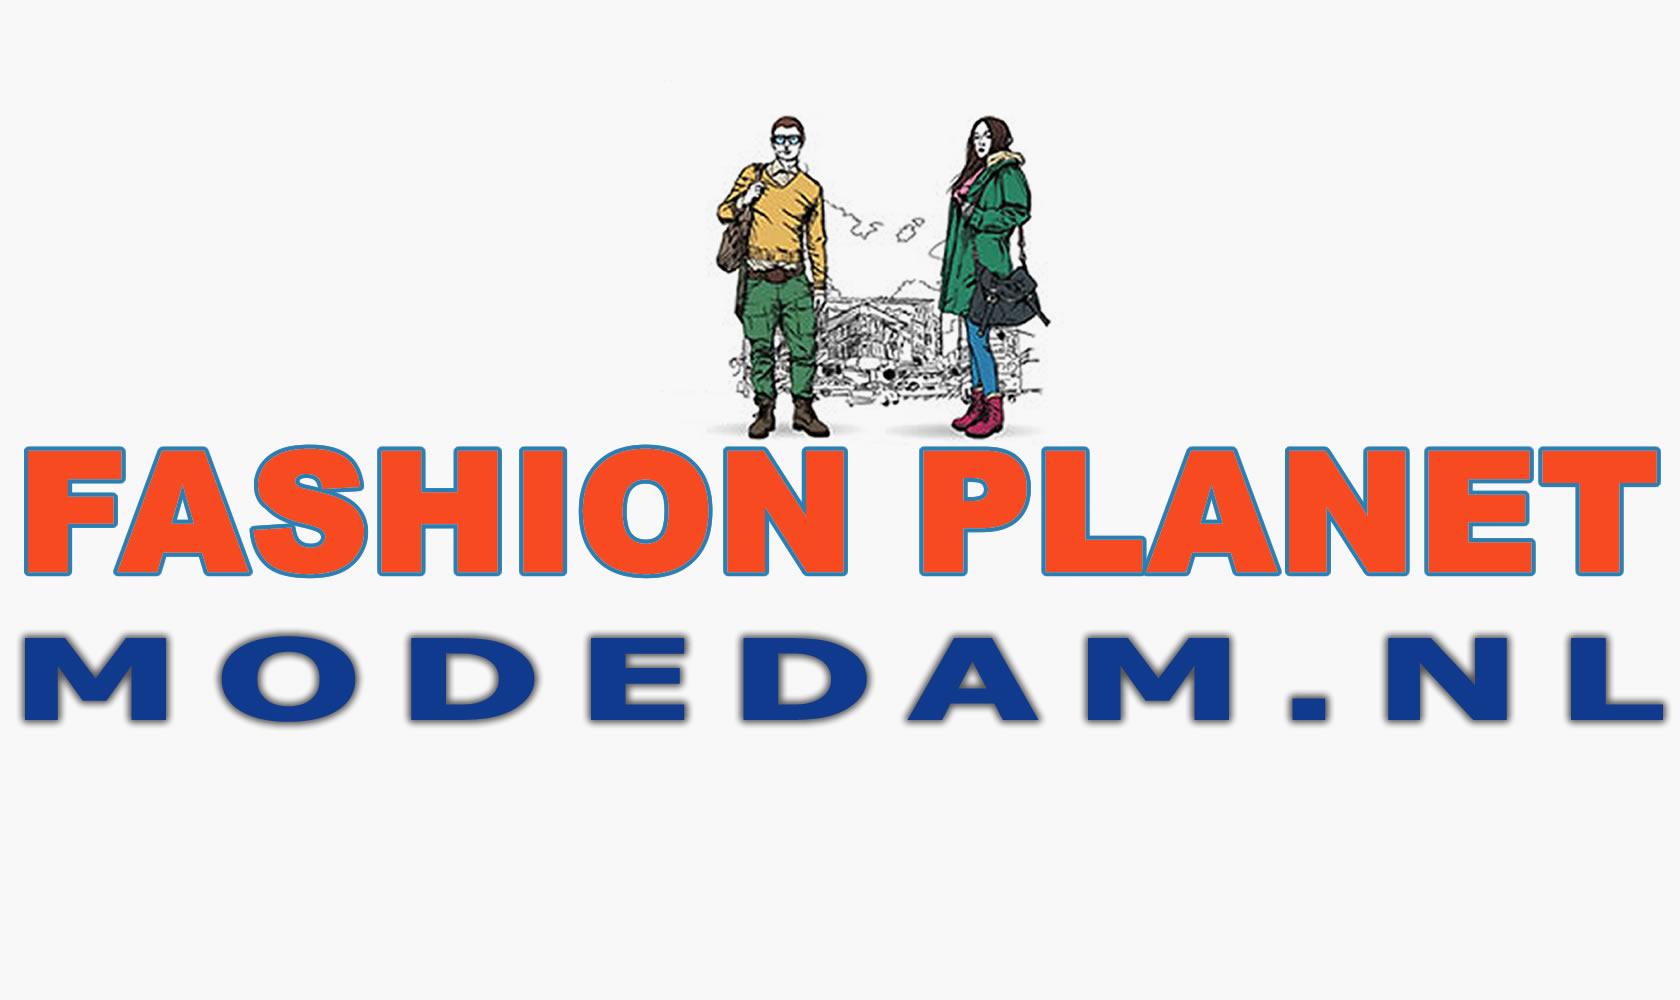 Fashion Planet (Modedam.nl) Kleding & Schoenen Webshop